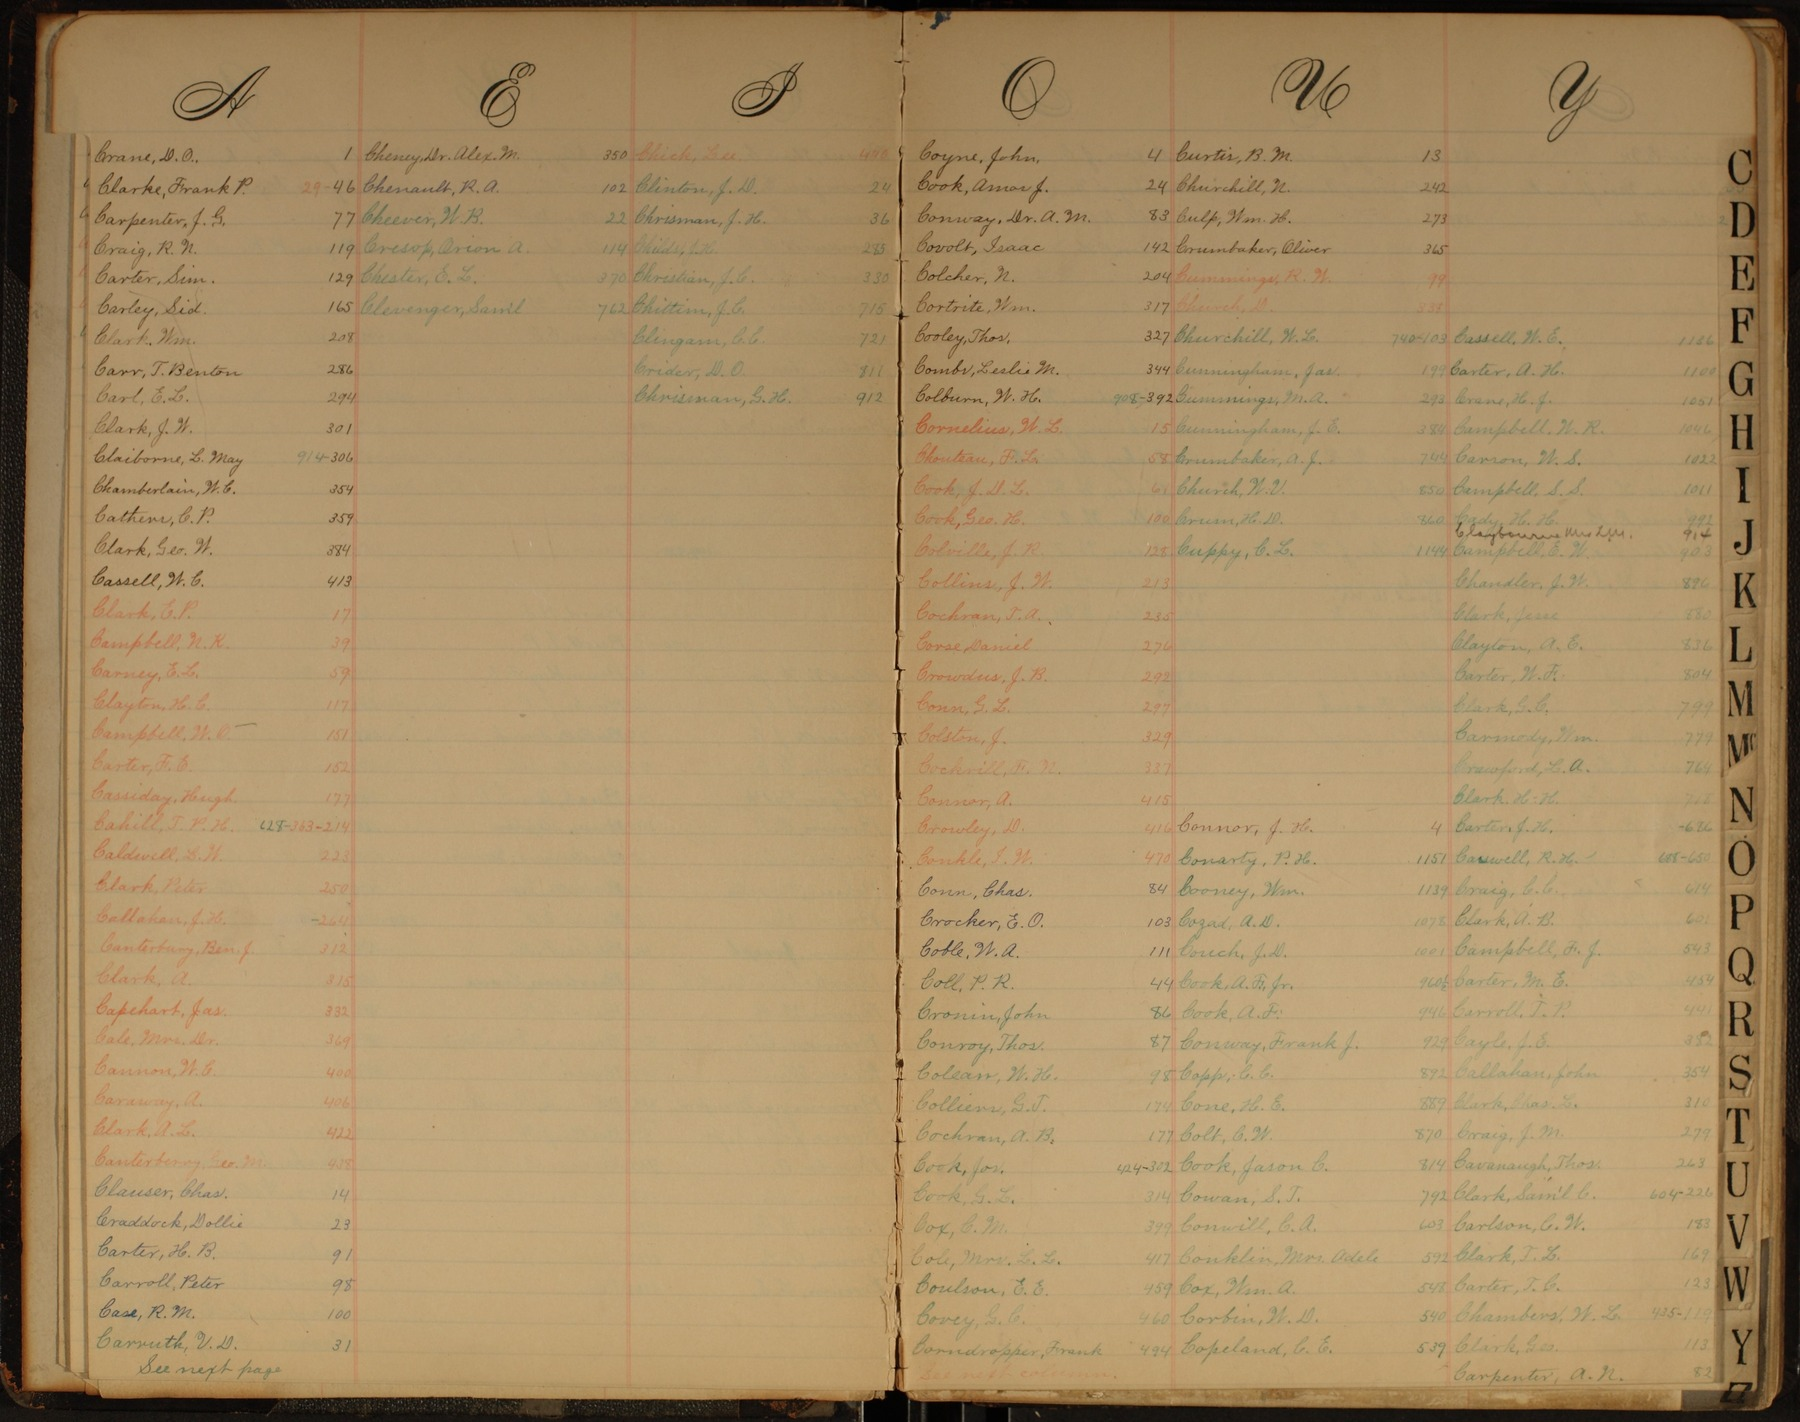 Hermon S. Major papers - Index C